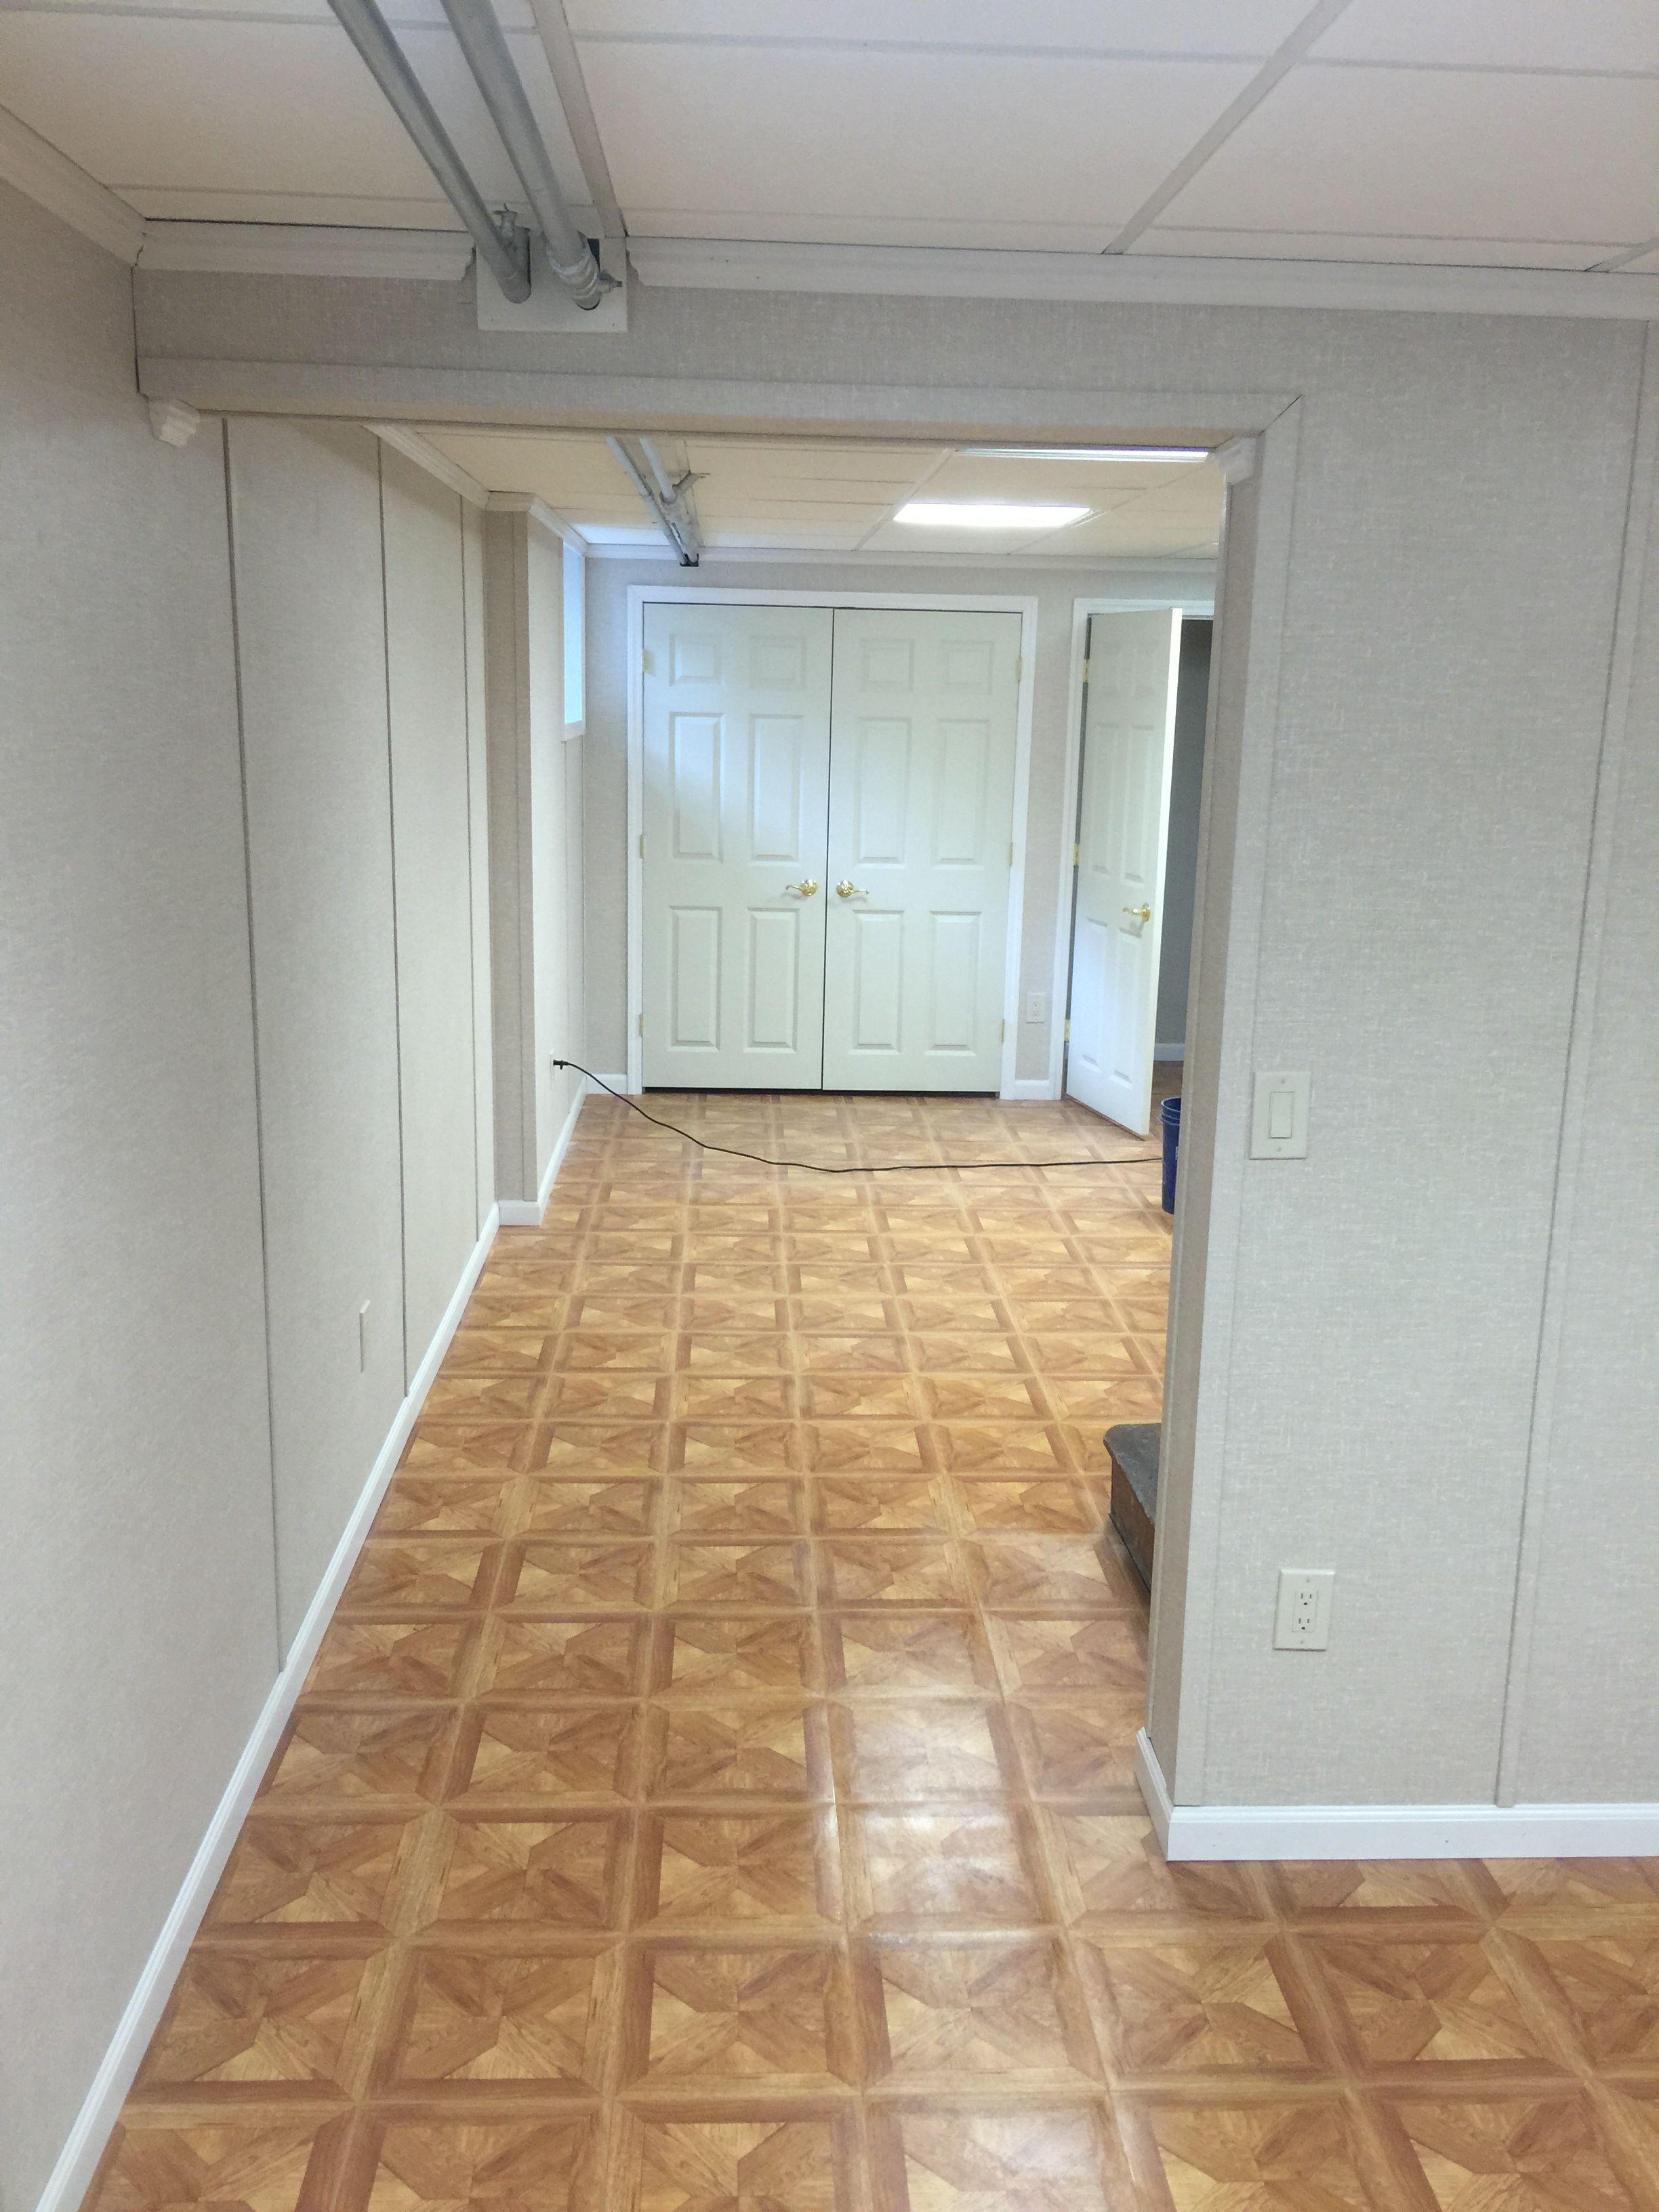 Thermaldry basement floor waterproofing tiles httpnextsoft21 thermaldry basement floor waterproofing tiles dailygadgetfo Images